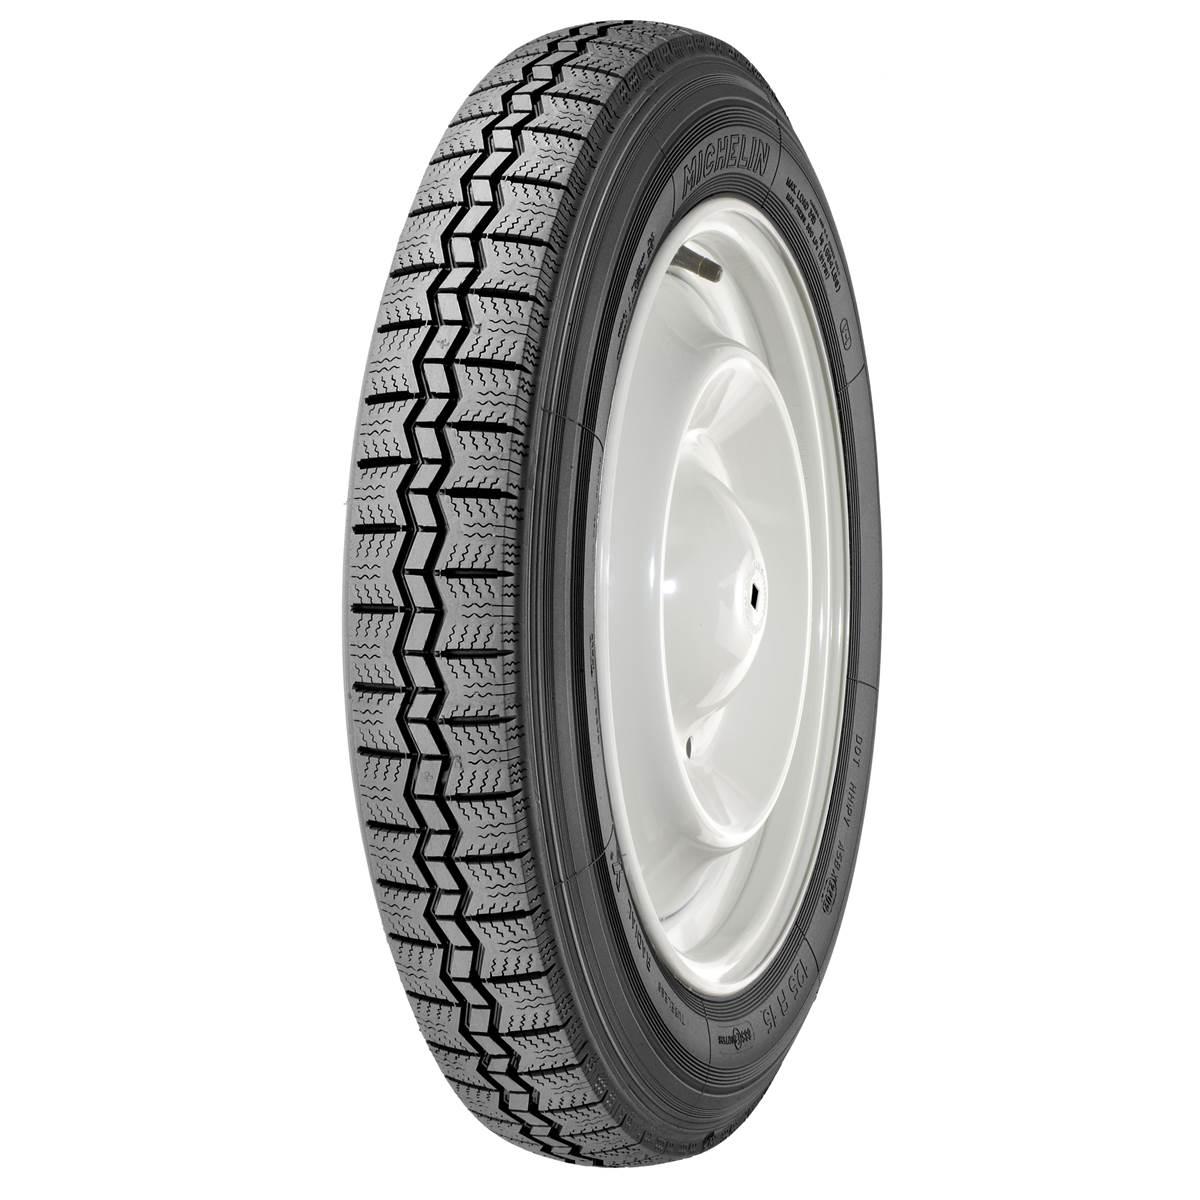 Pneu Michelin Collection 185/80R16 92S X